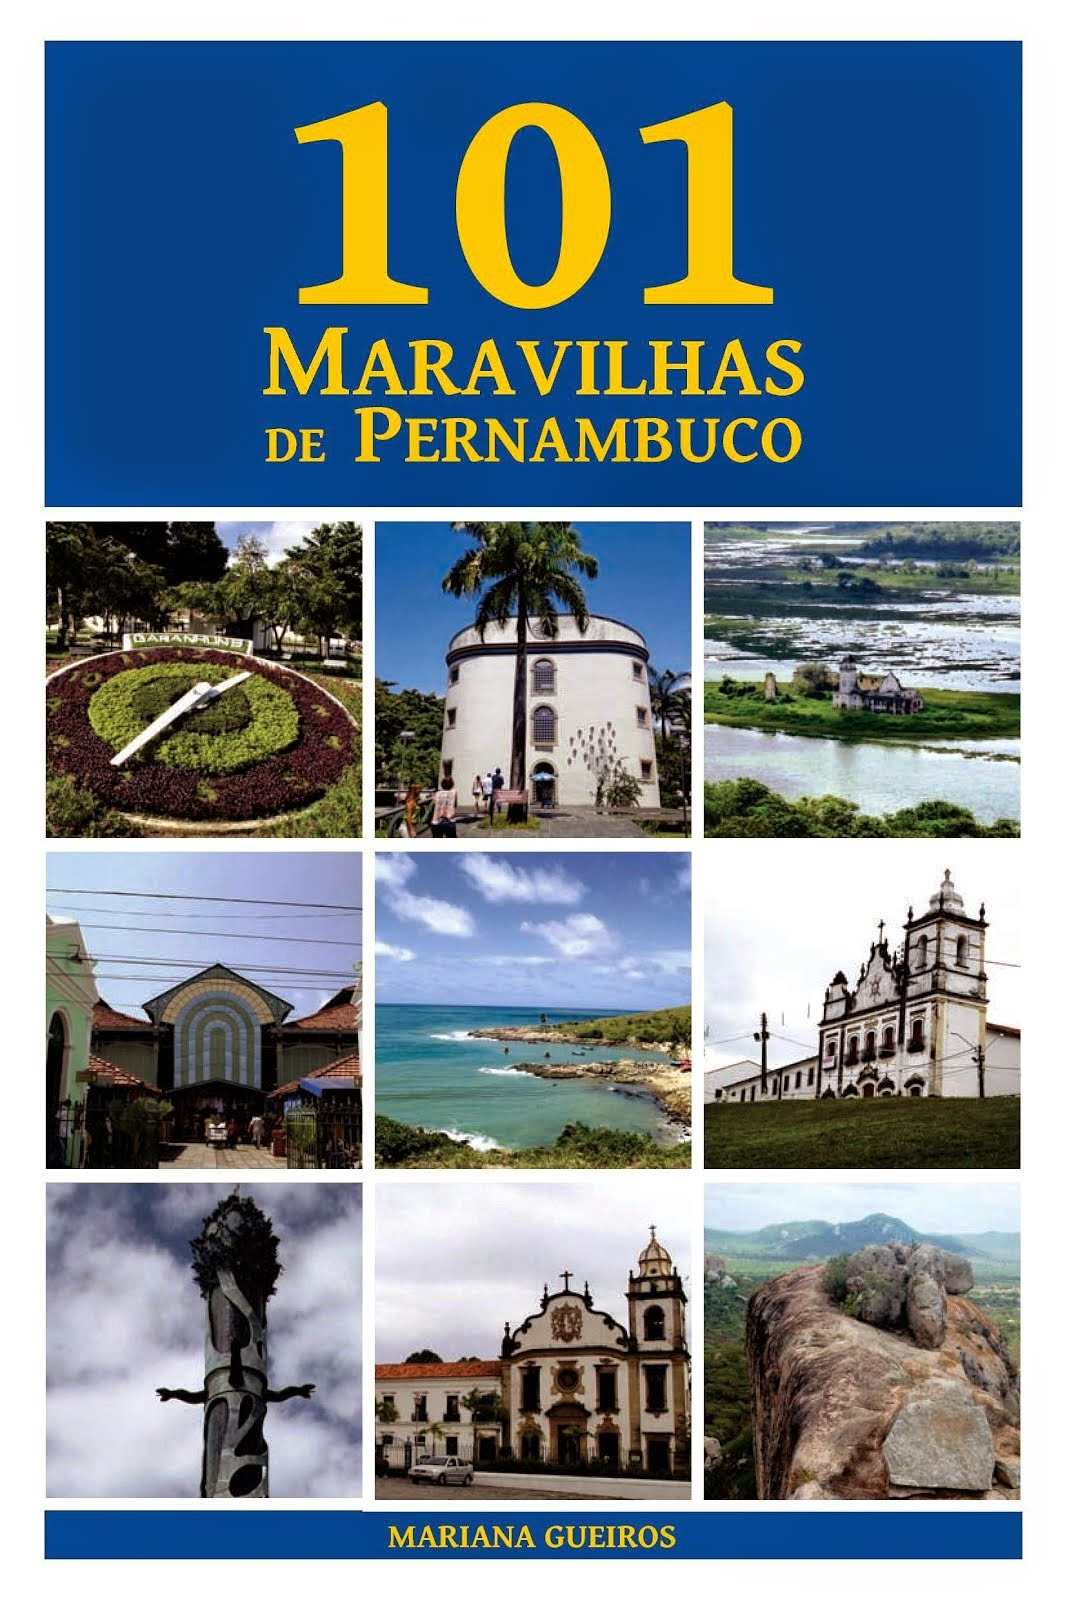 E-book 101 Maravilhas de Pernambuco